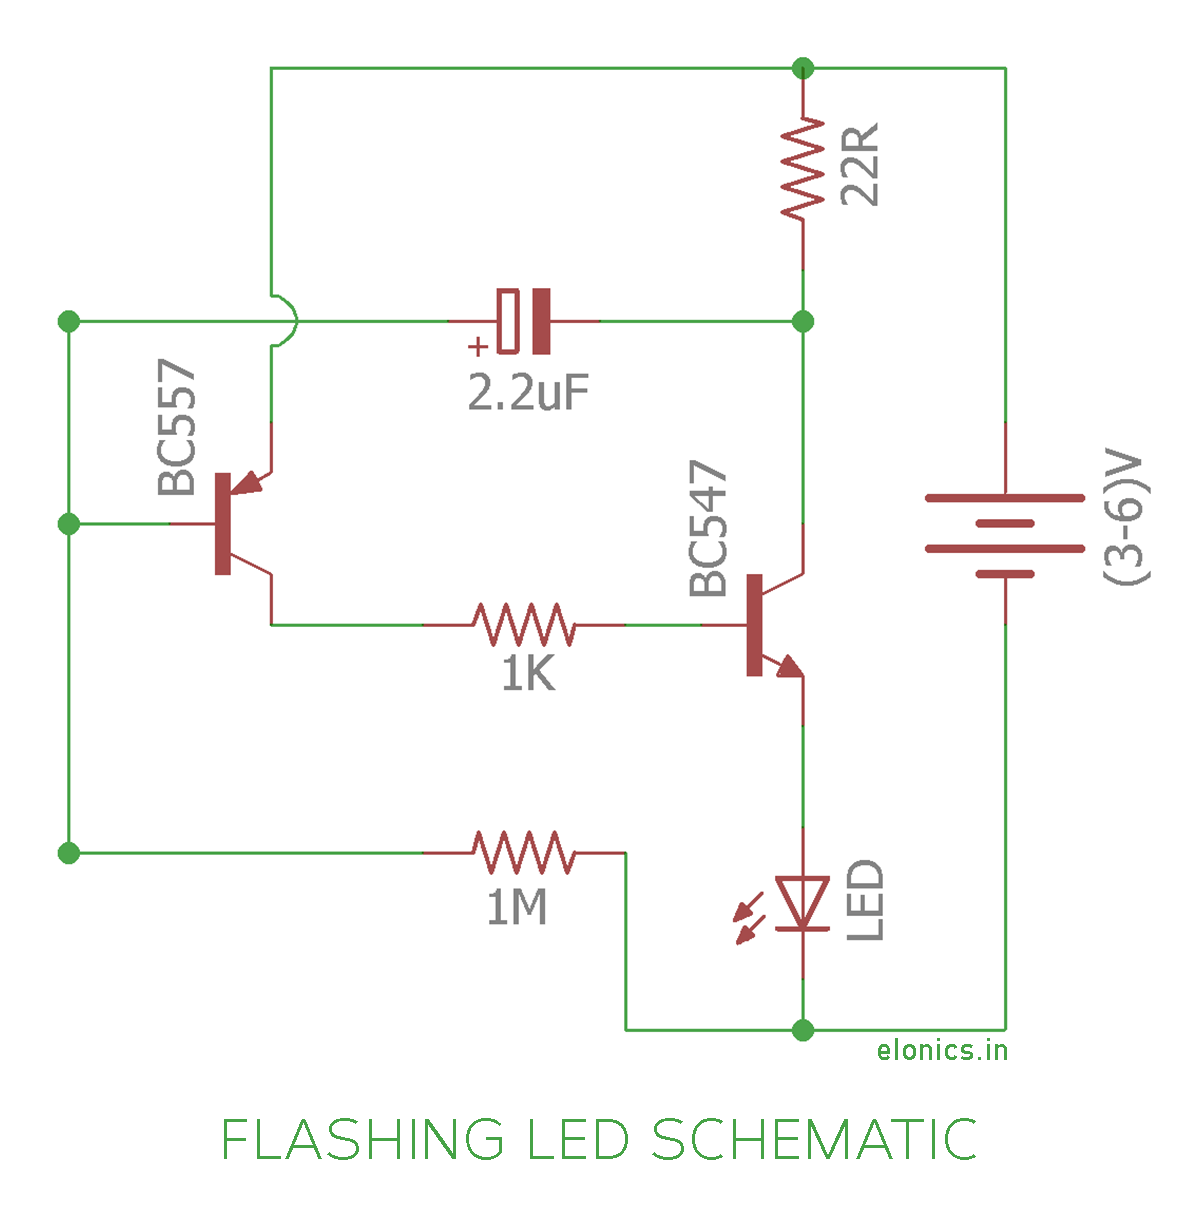 medium resolution of flashing blinking led circuit using transistors schematic